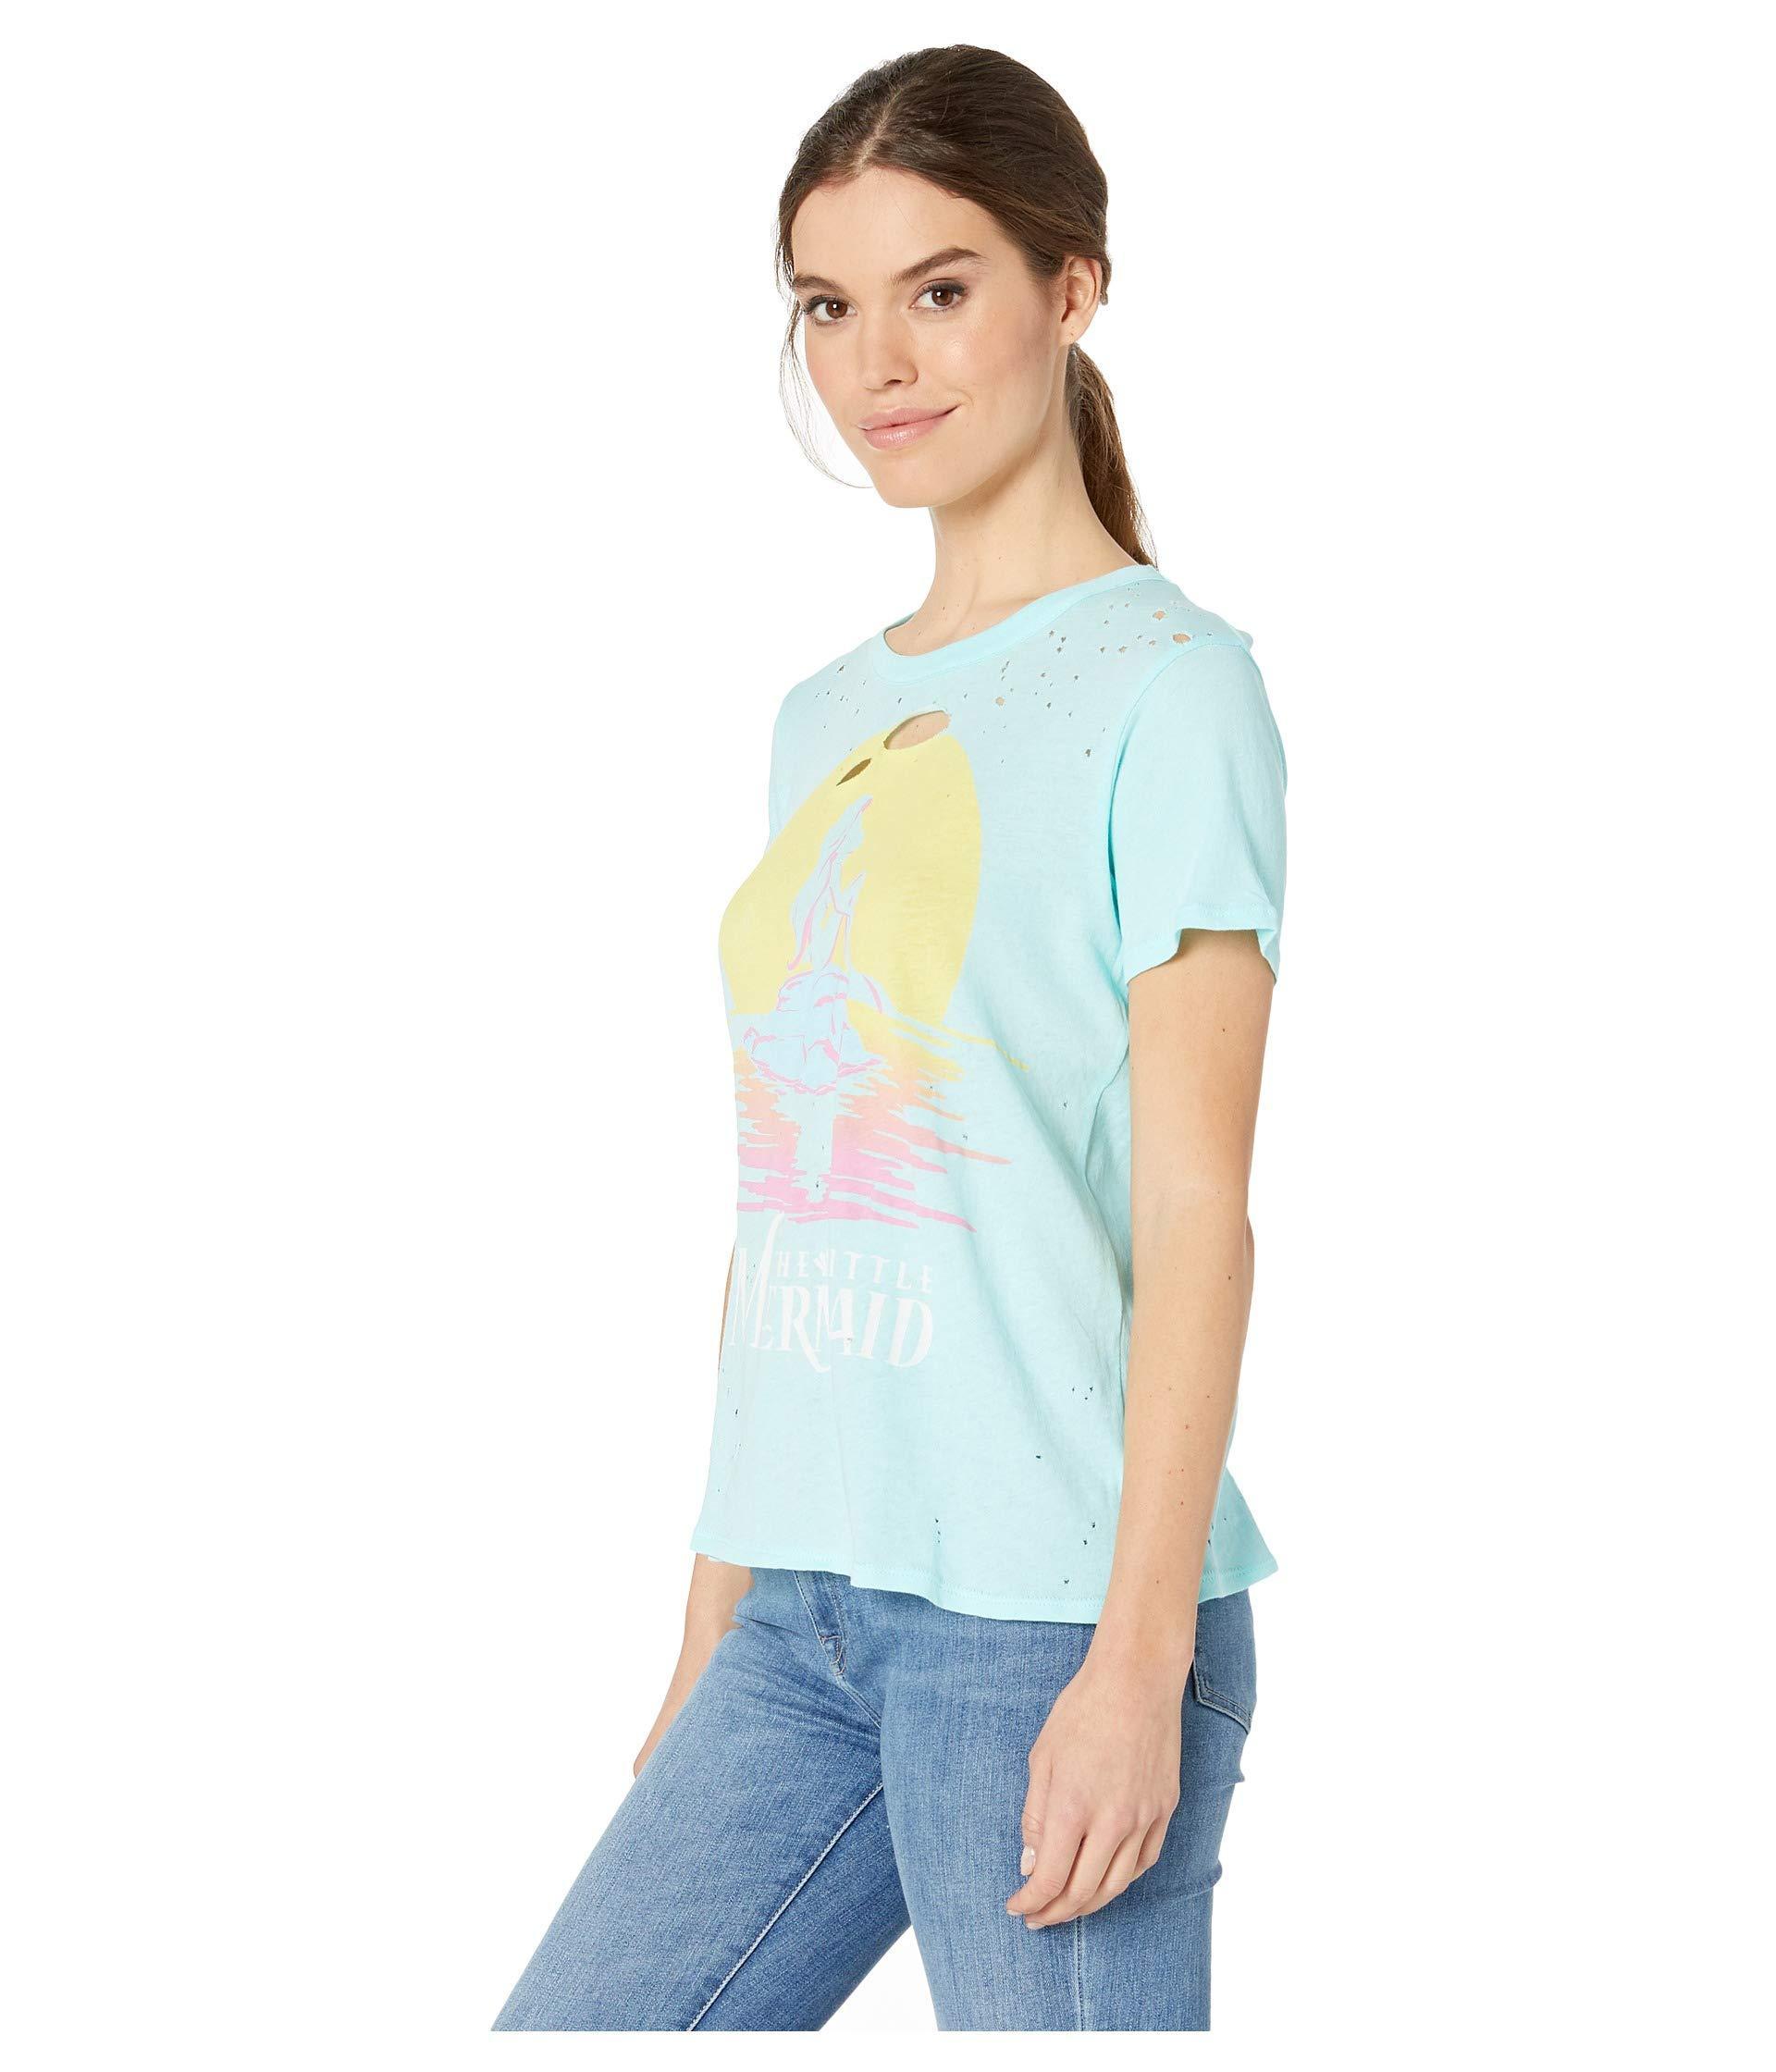 43f5064c40da95 Lyst - Chaser The Little Mermaid X   Short Sleeve Crew Neck Tee (breezy) Women s  T Shirt in Blue